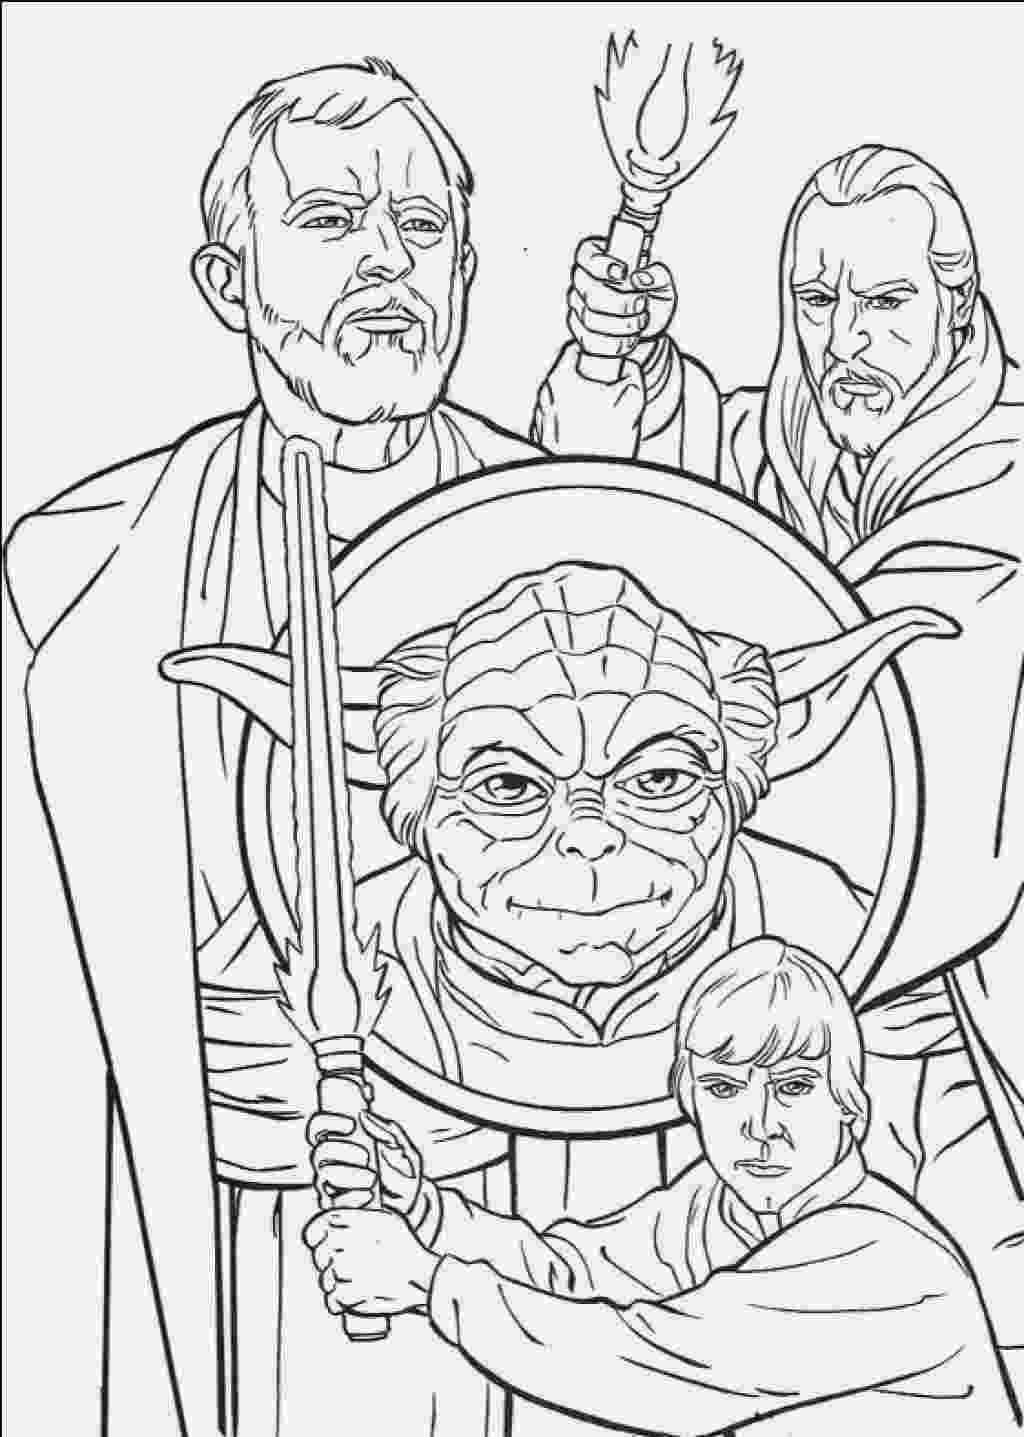 coloring pages printable star wars star wars coloring pages 2018 dr odd star coloring pages printable wars